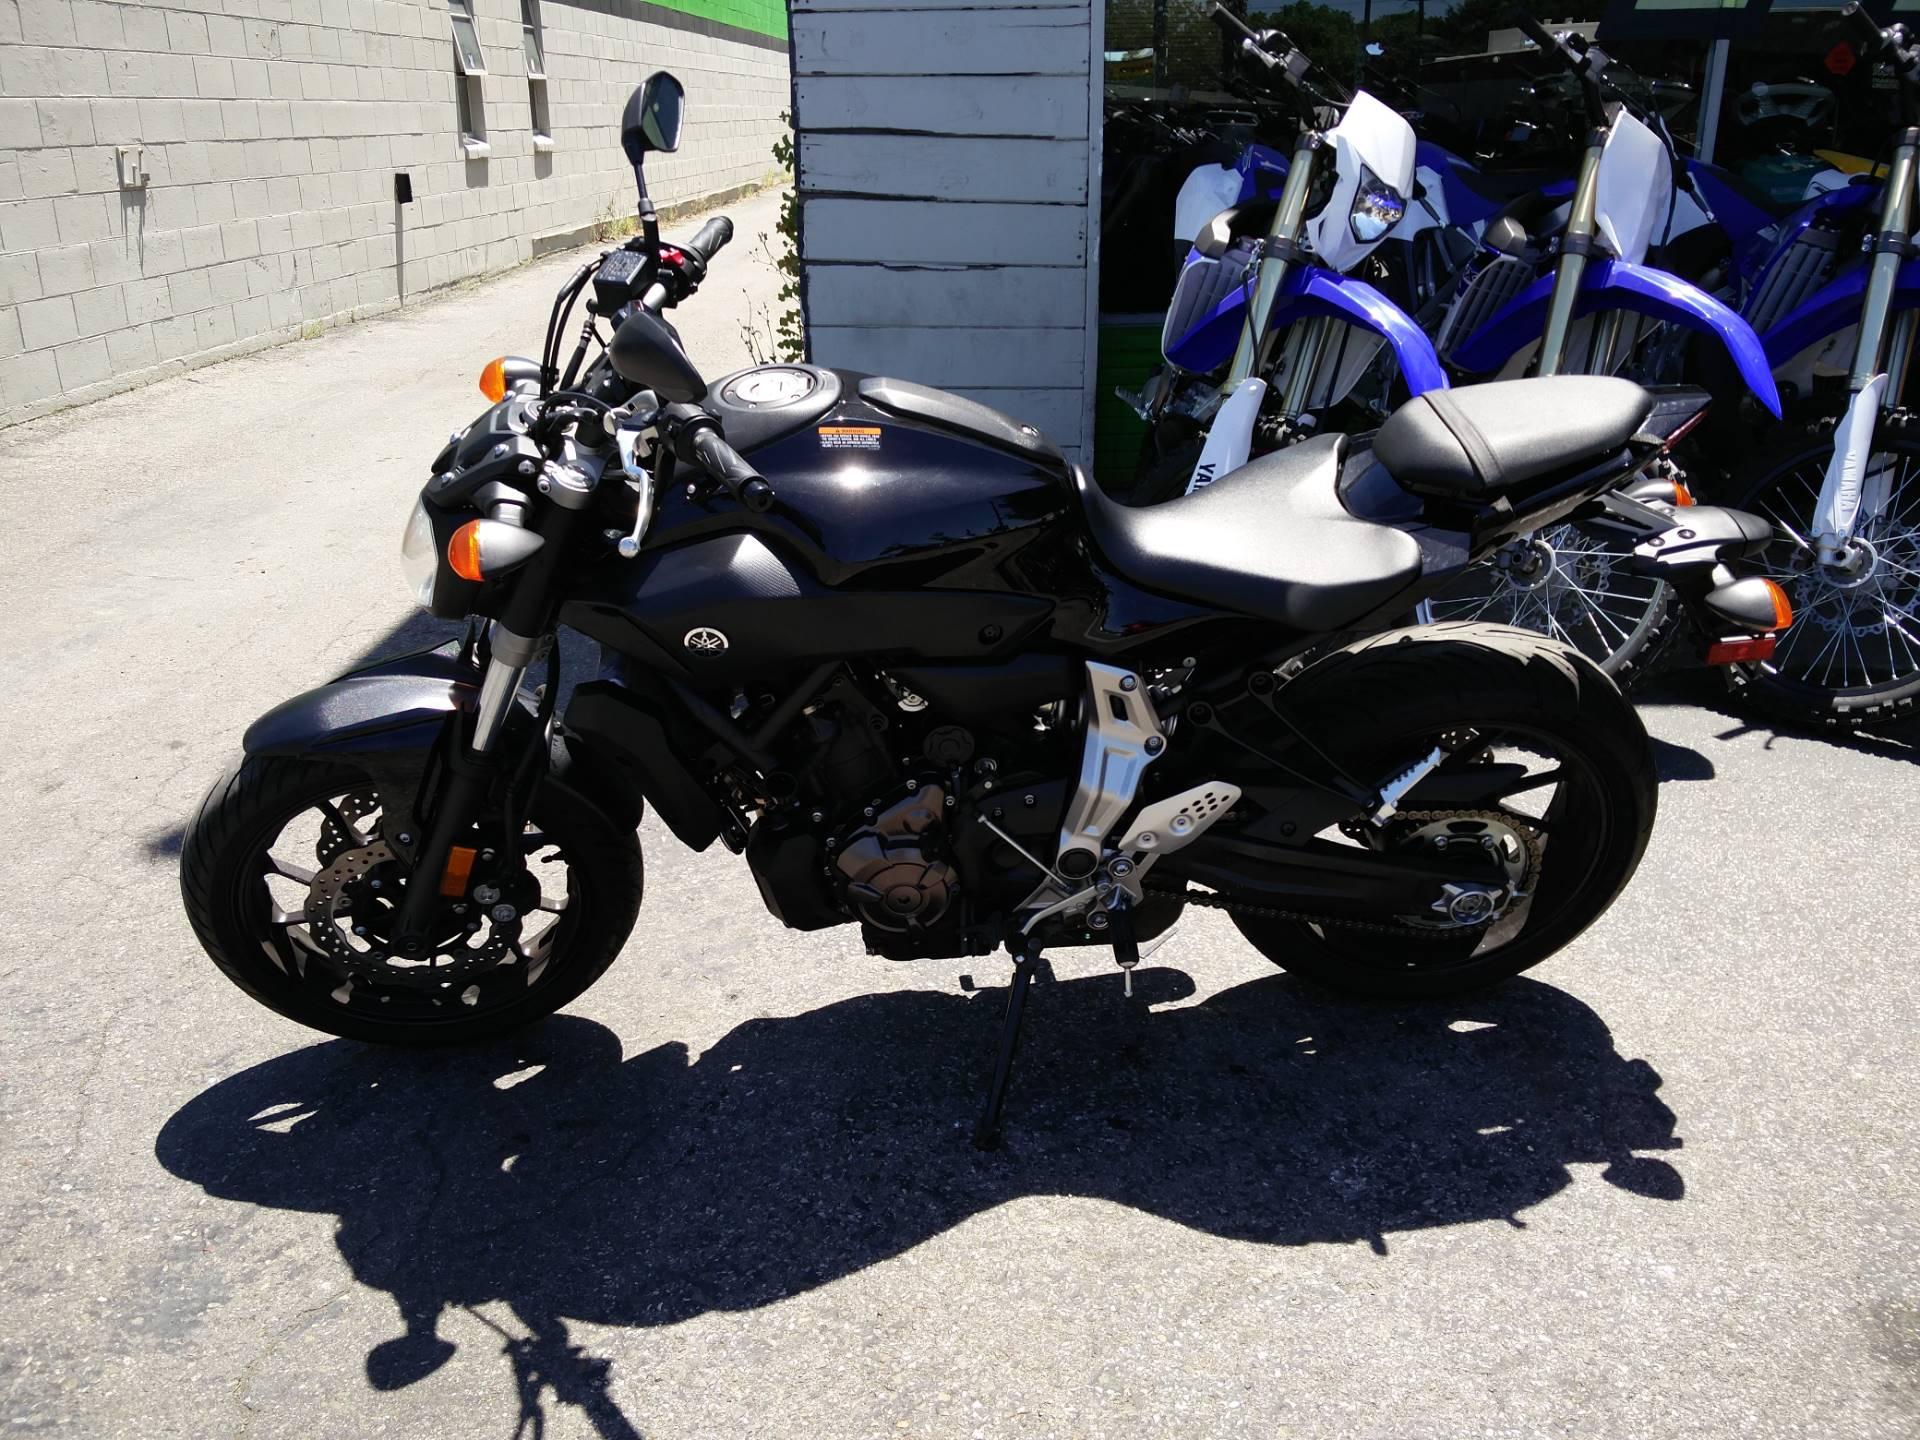 2016 Yamaha FZ-07 for sale 23621